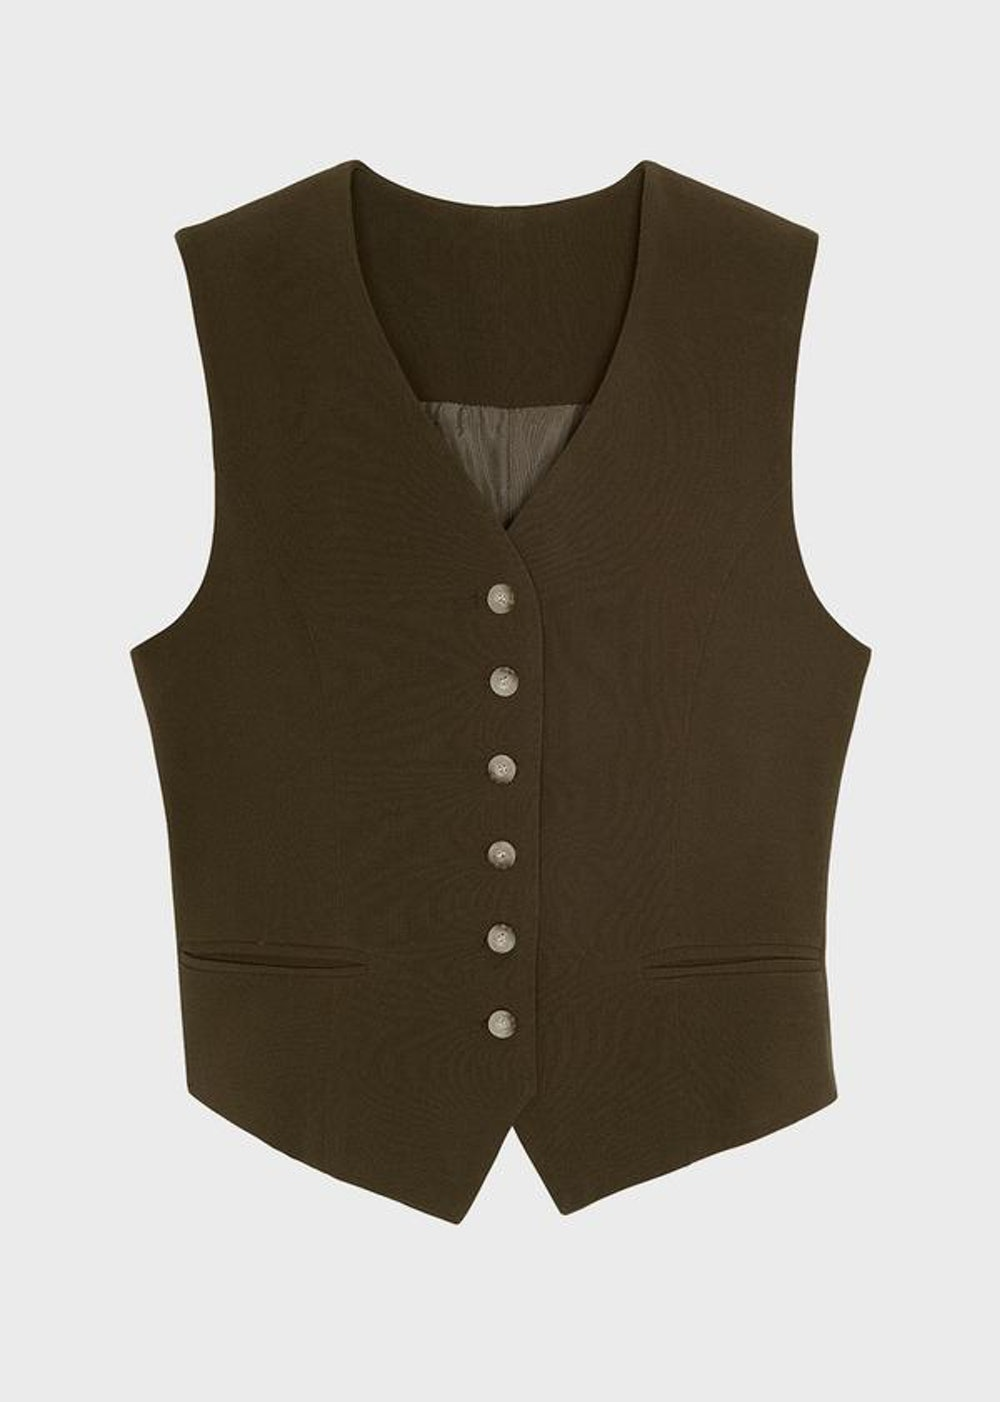 Tailored Vest in Cardomom